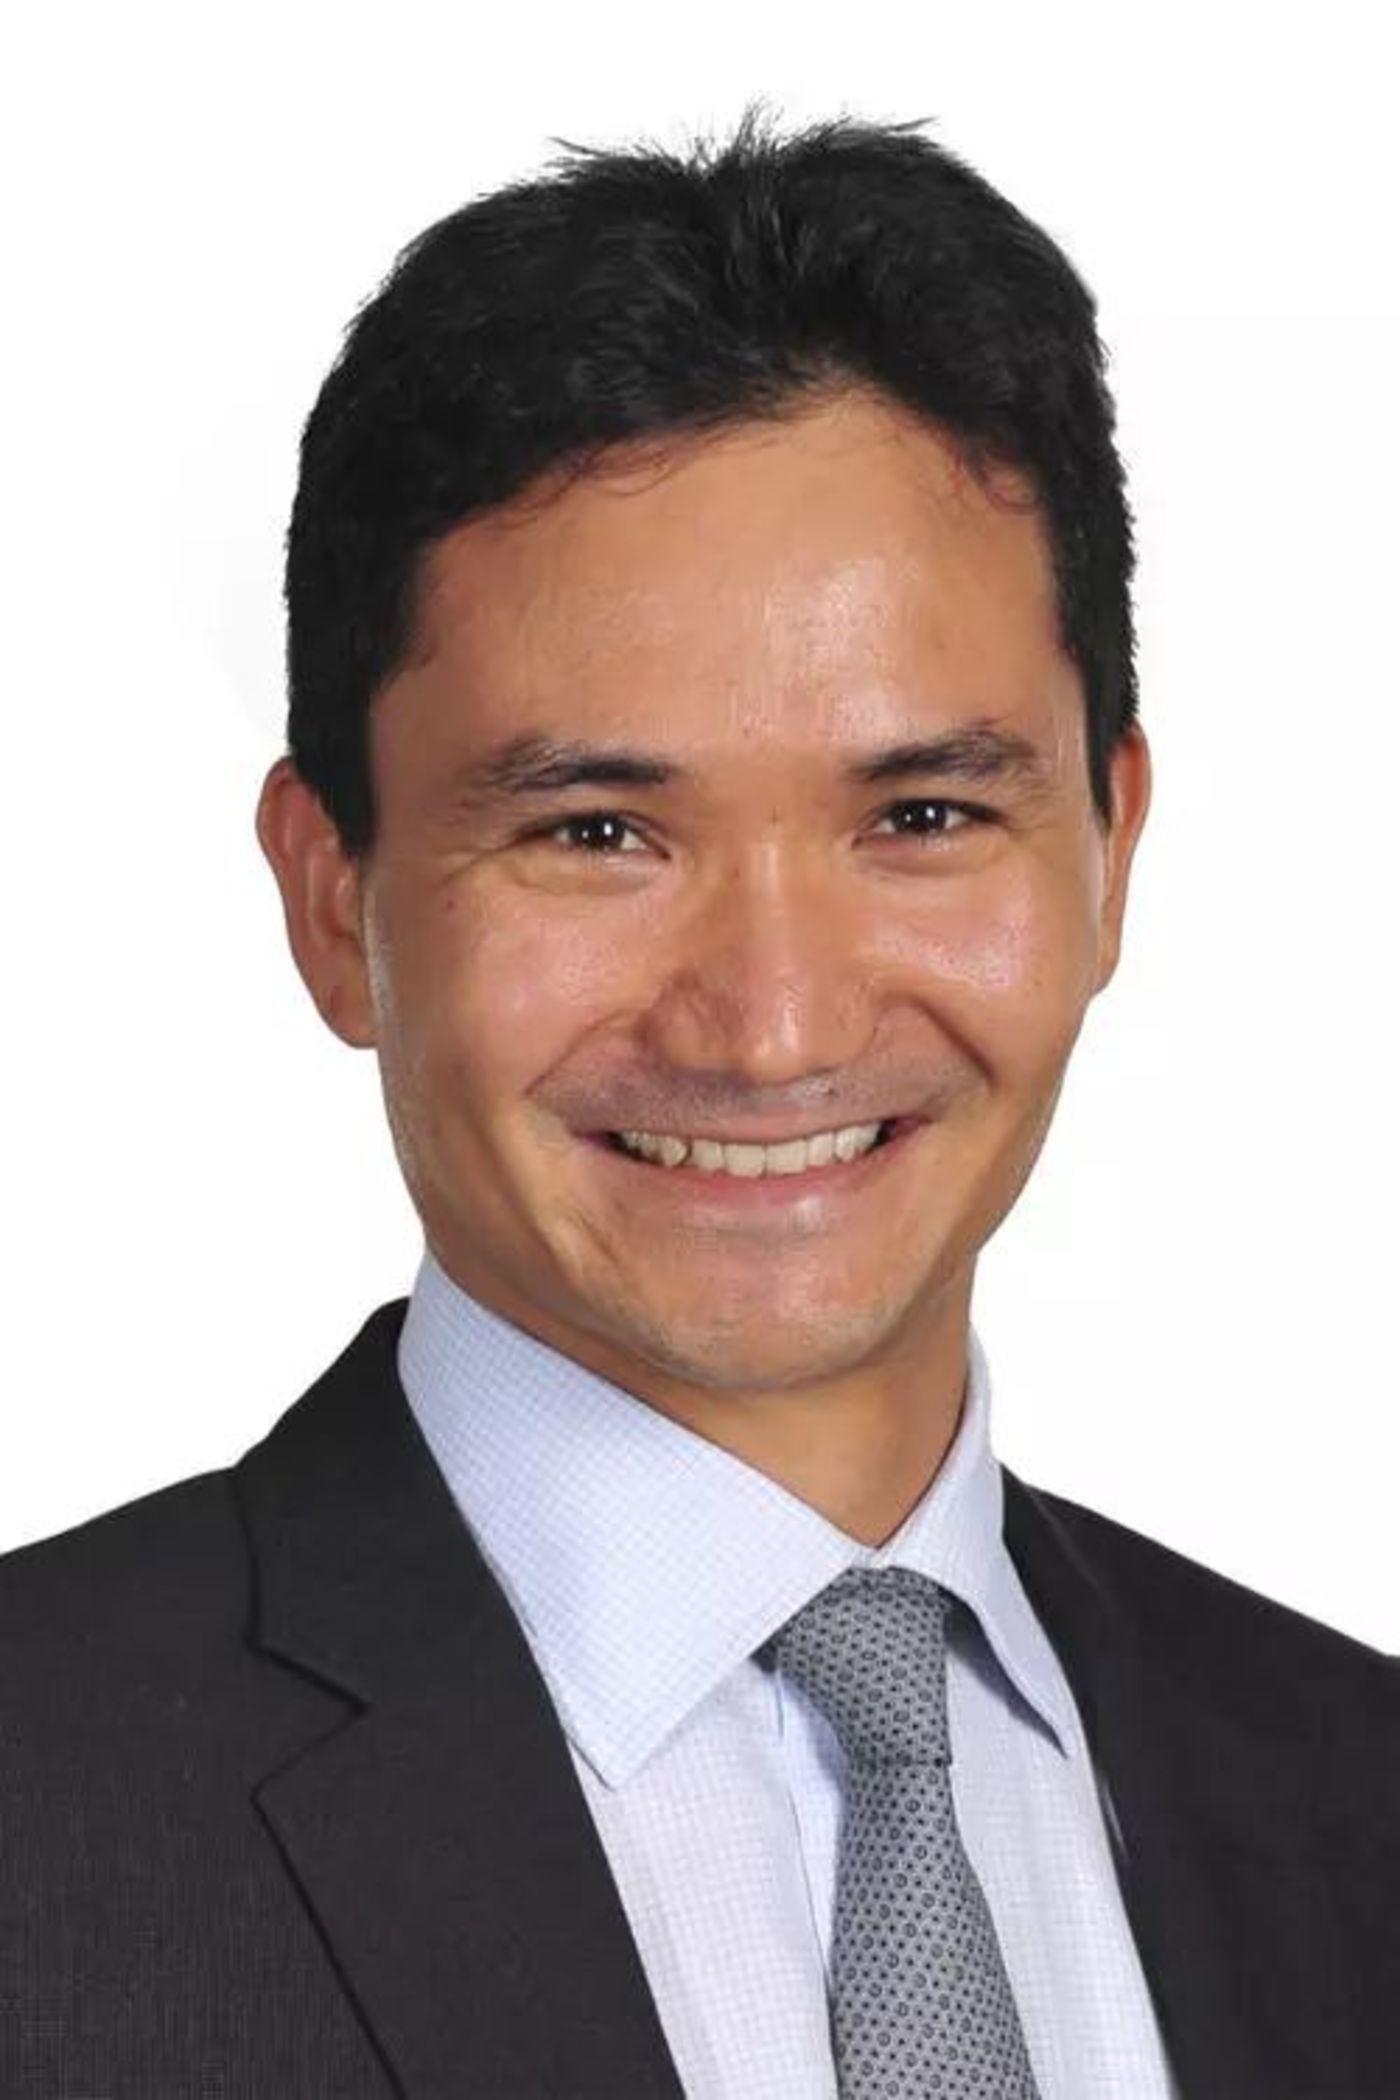 James Mitchell担任CSO前,刘炽平担任首席战略官长达6年之久